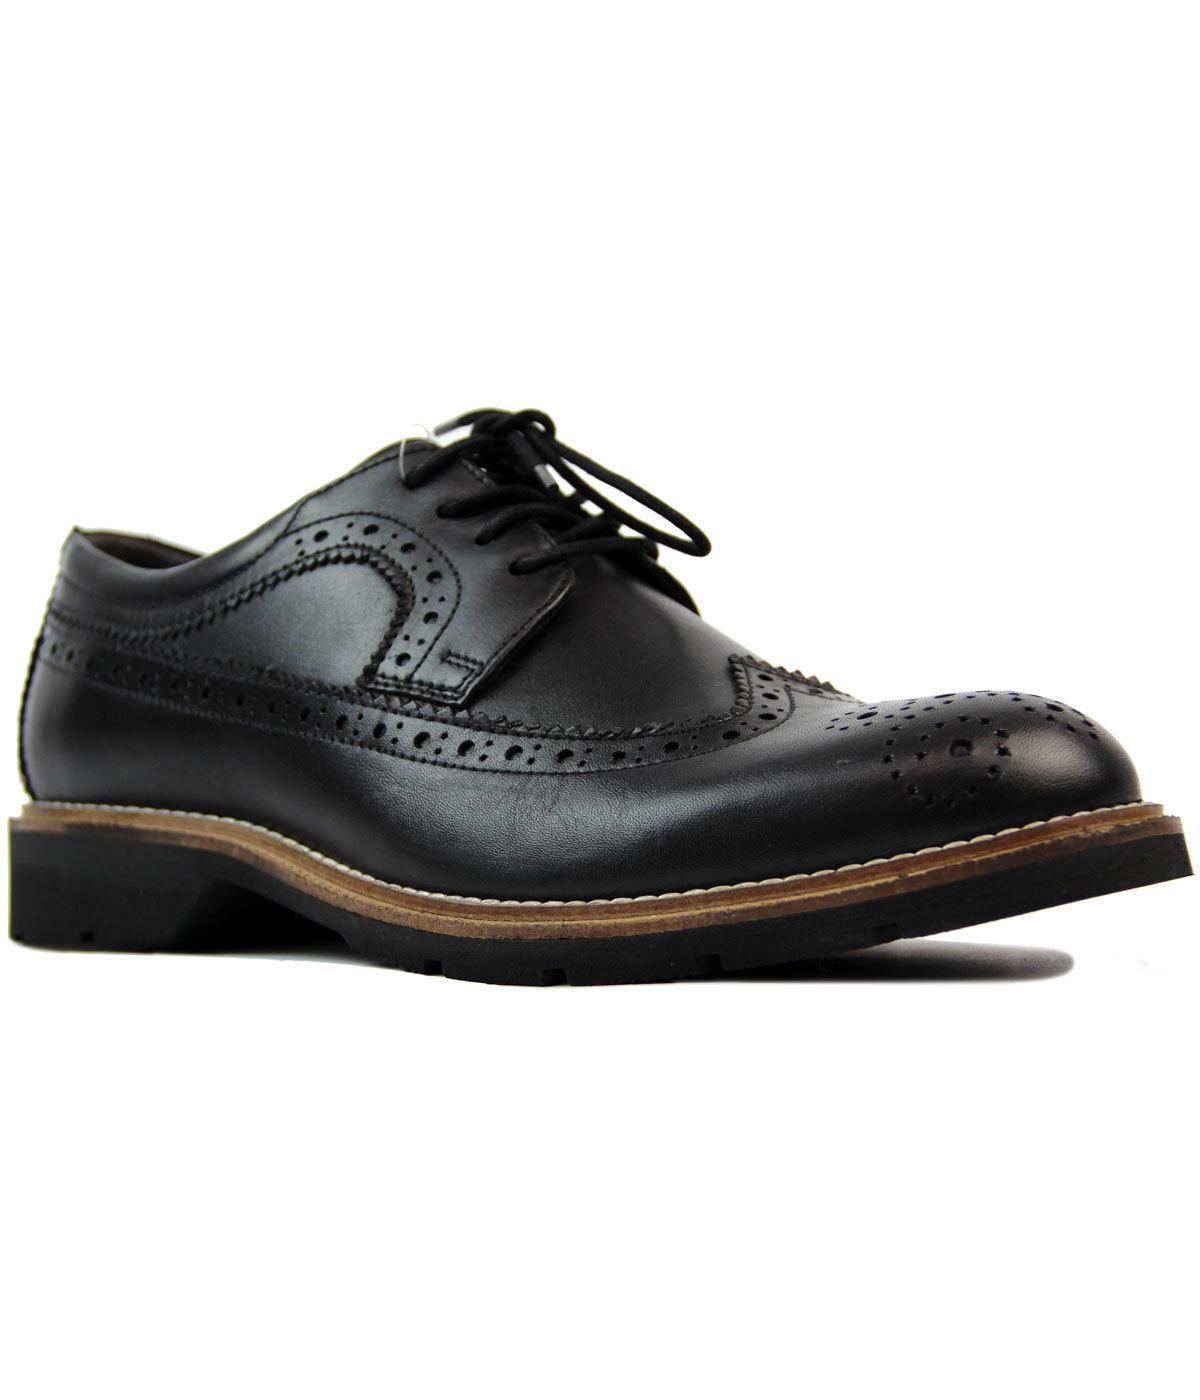 Harvard Retro Mod Wing Cap Brogue Gibson Shoes (B)